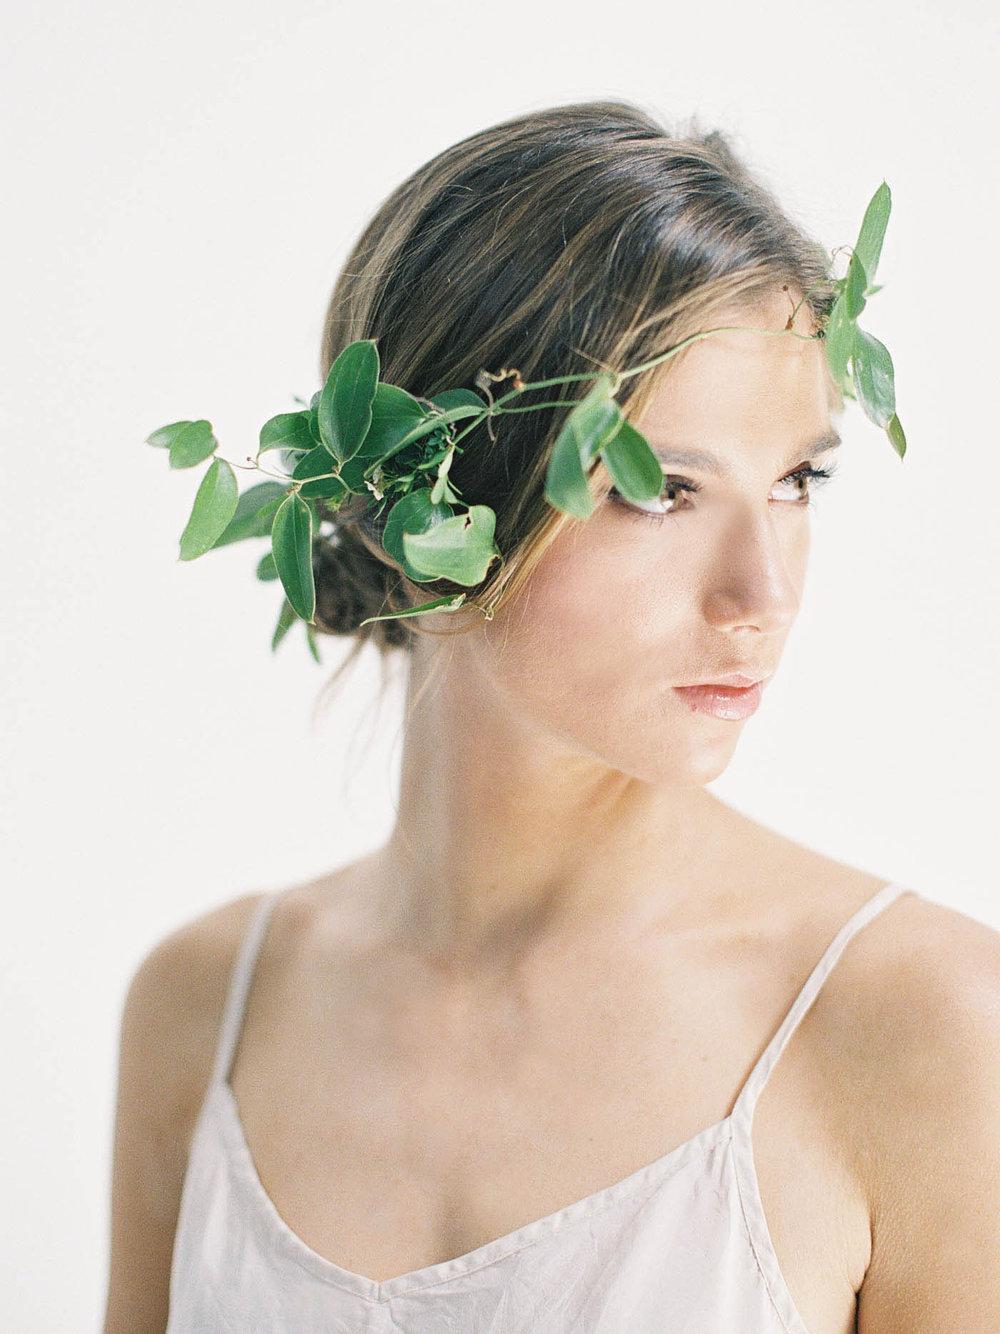 floral-crown-4-Jen_Huang-006837-R1-E005.jpg